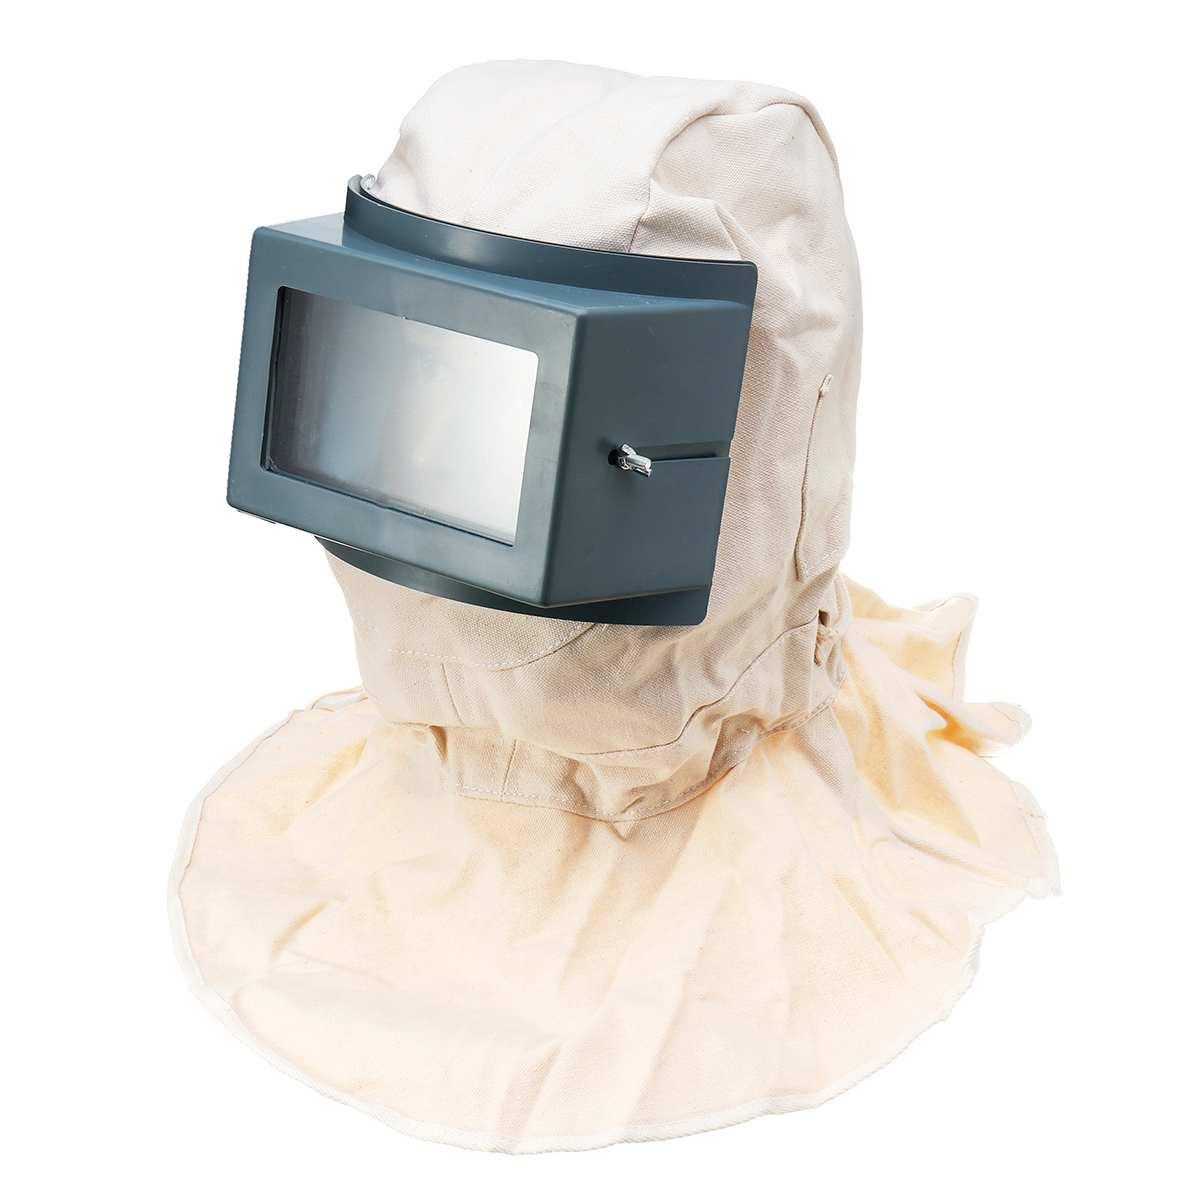 Safety Sandblast Sandblasting Helmet Hood Protector Mask Anti Dust Spray Paint Workplace Safety Protective Masks Accessories